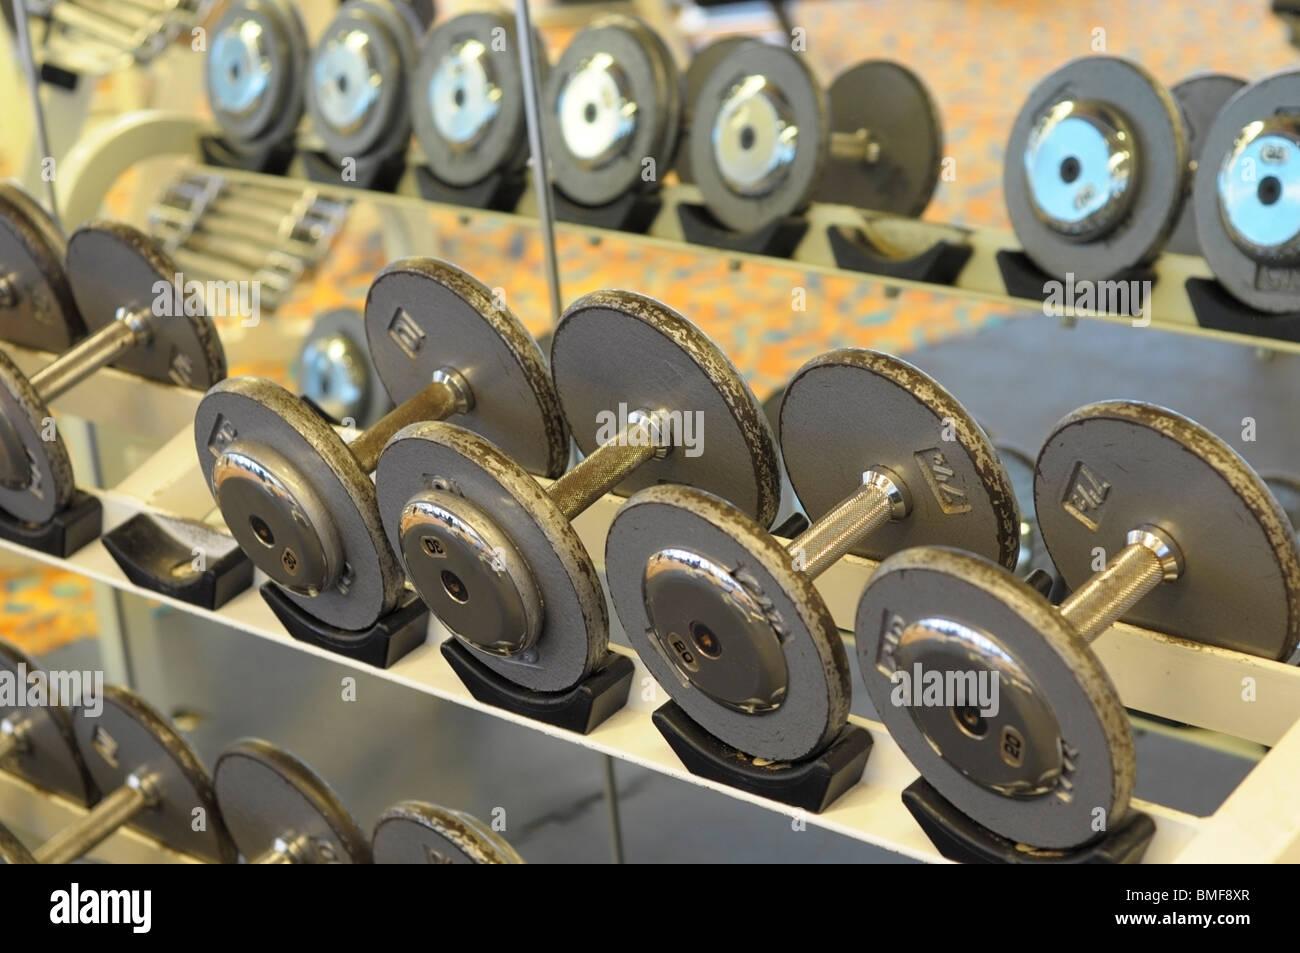 Dumbbells, Bar Bells - Stock Image